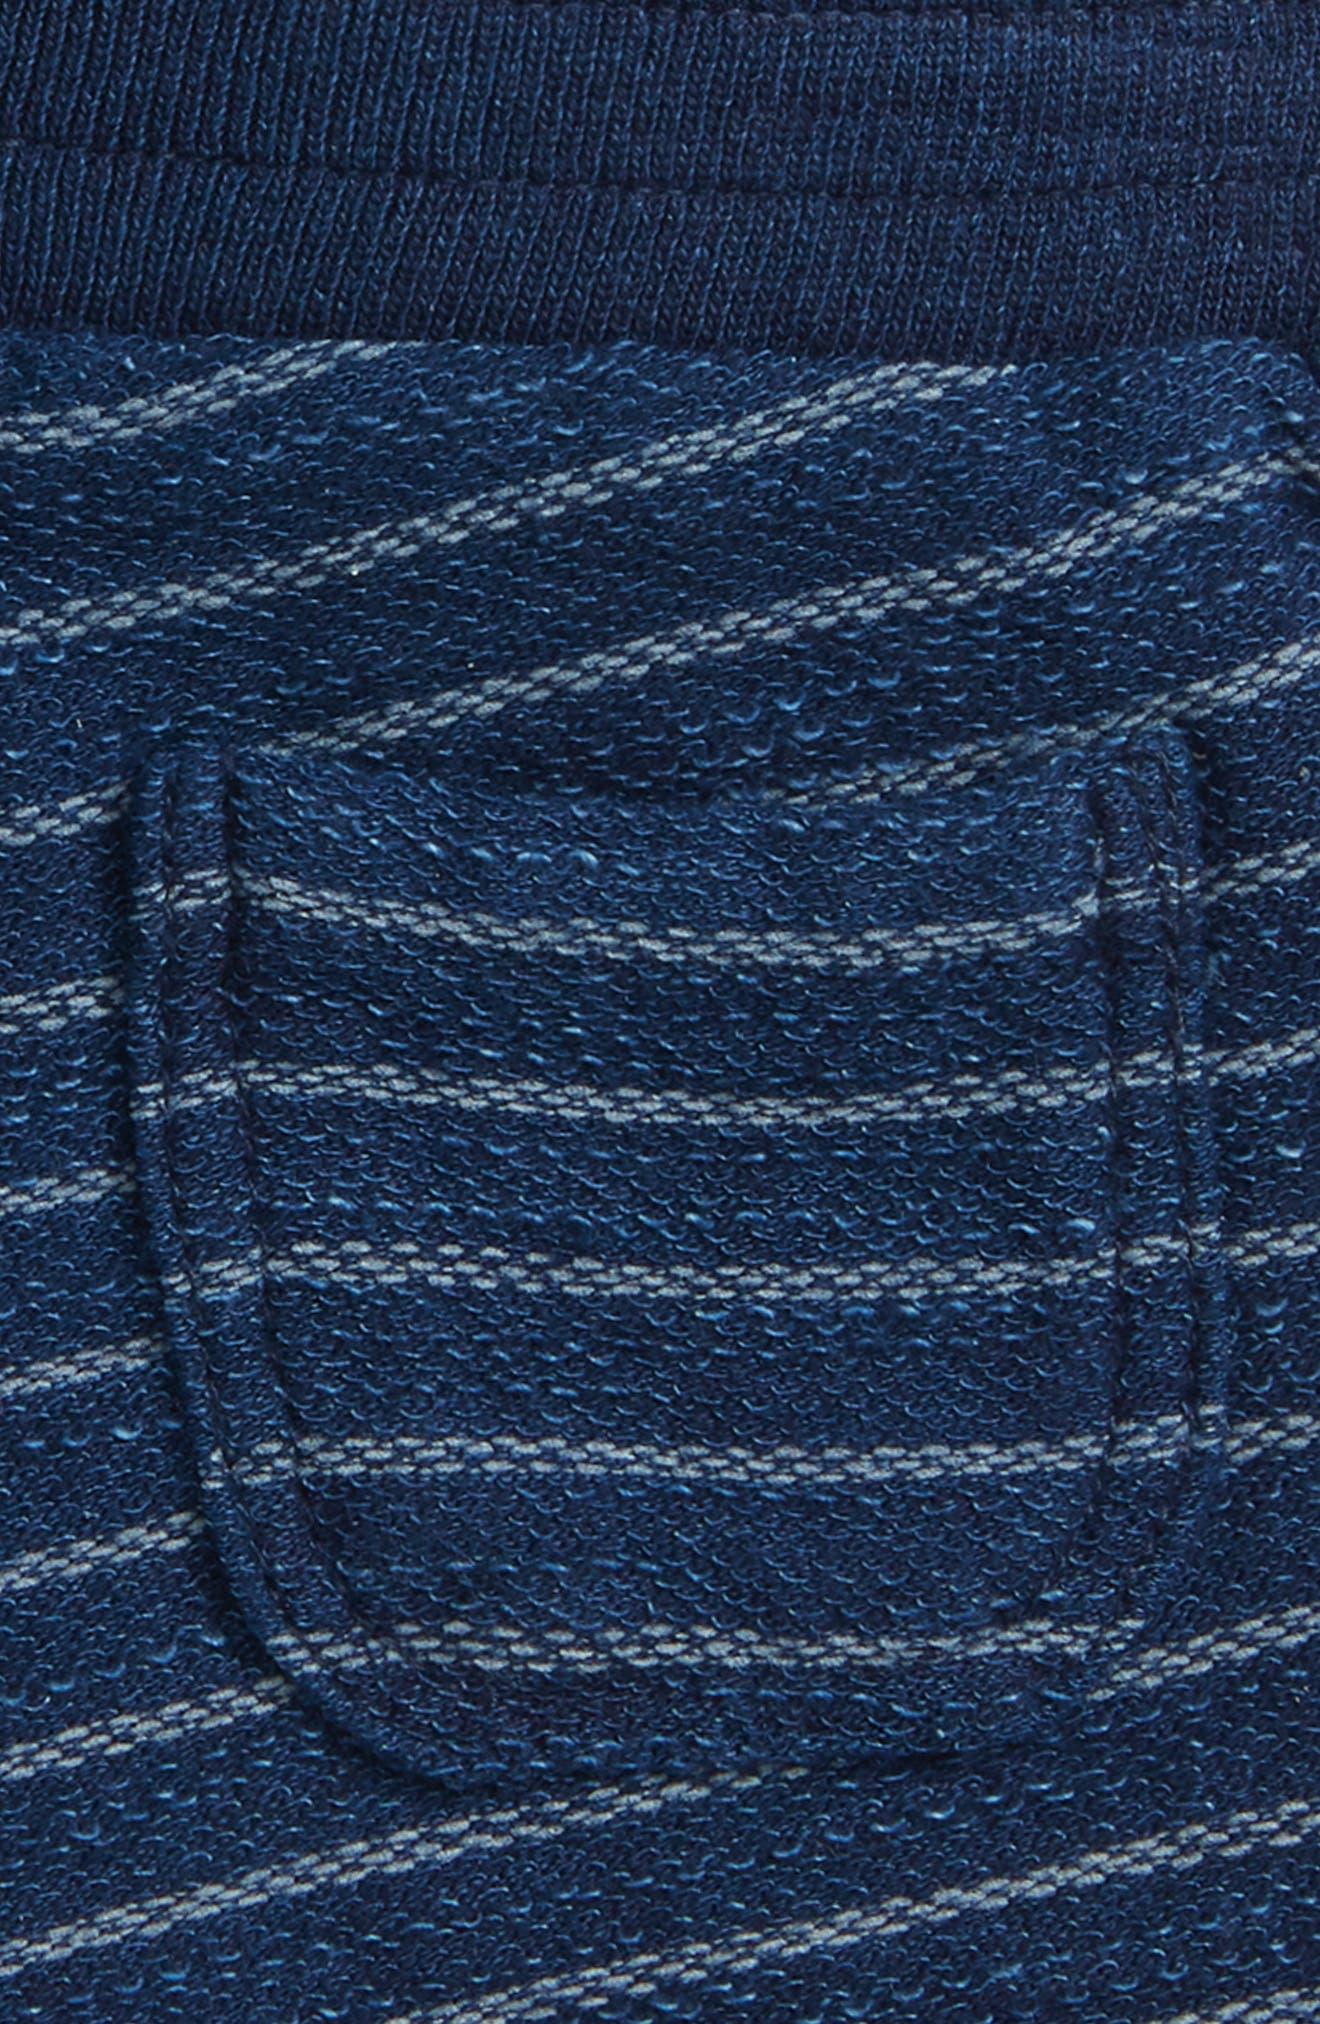 Indigo Stripe French Terry Shorts,                             Alternate thumbnail 3, color,                             Dark Stone/ Indigo